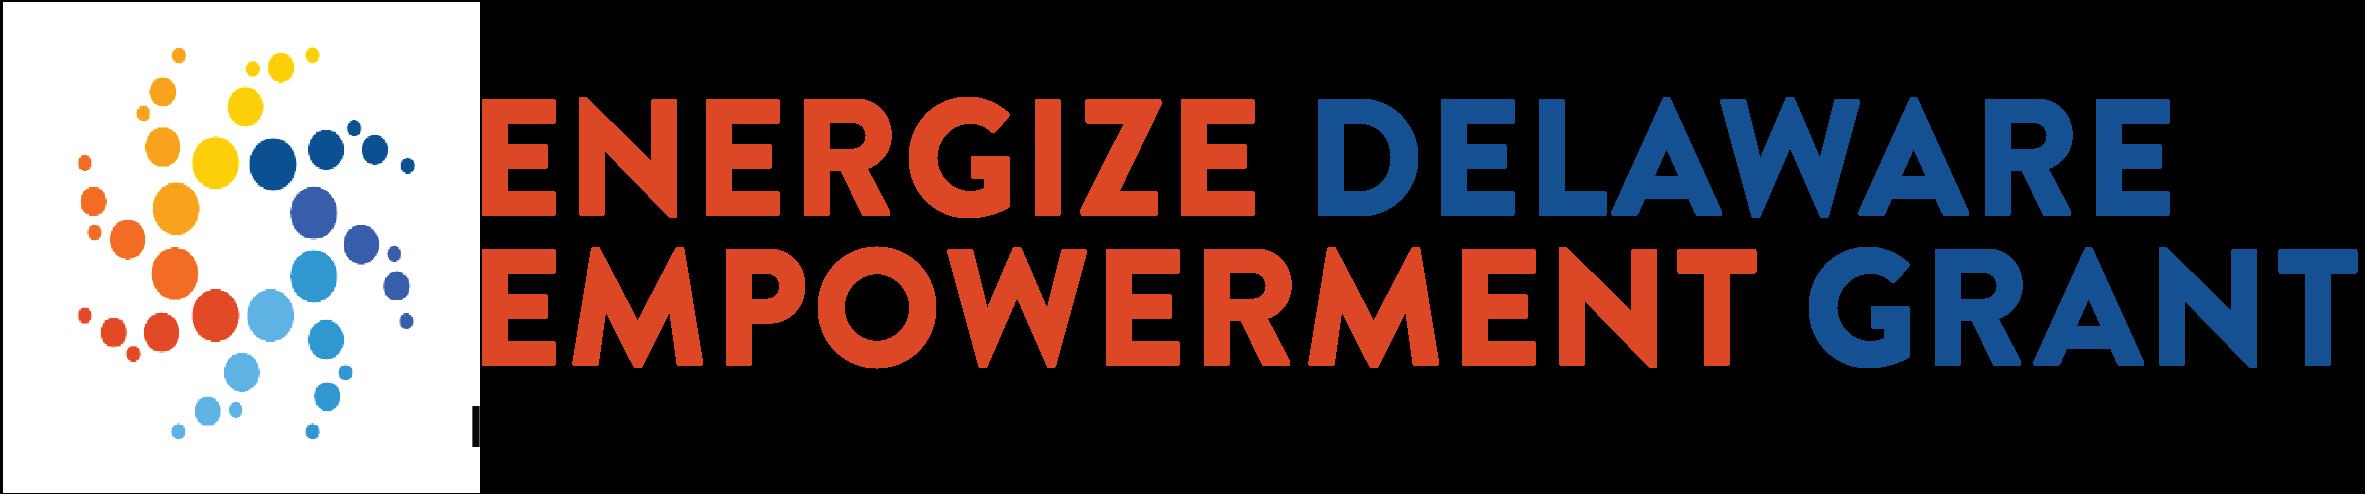 DE Empowerment Grant